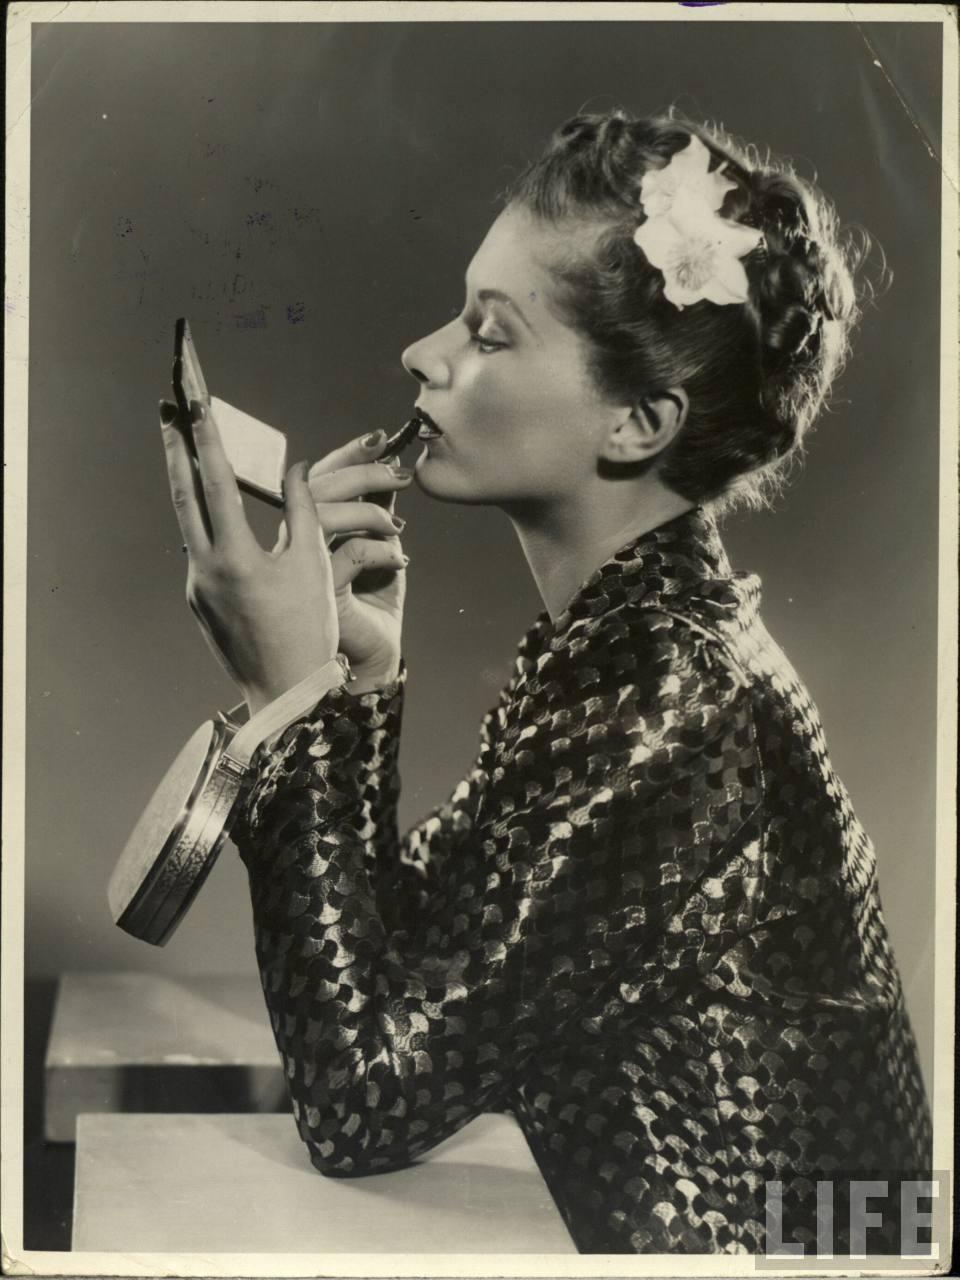 Lipstick-1940s Ad